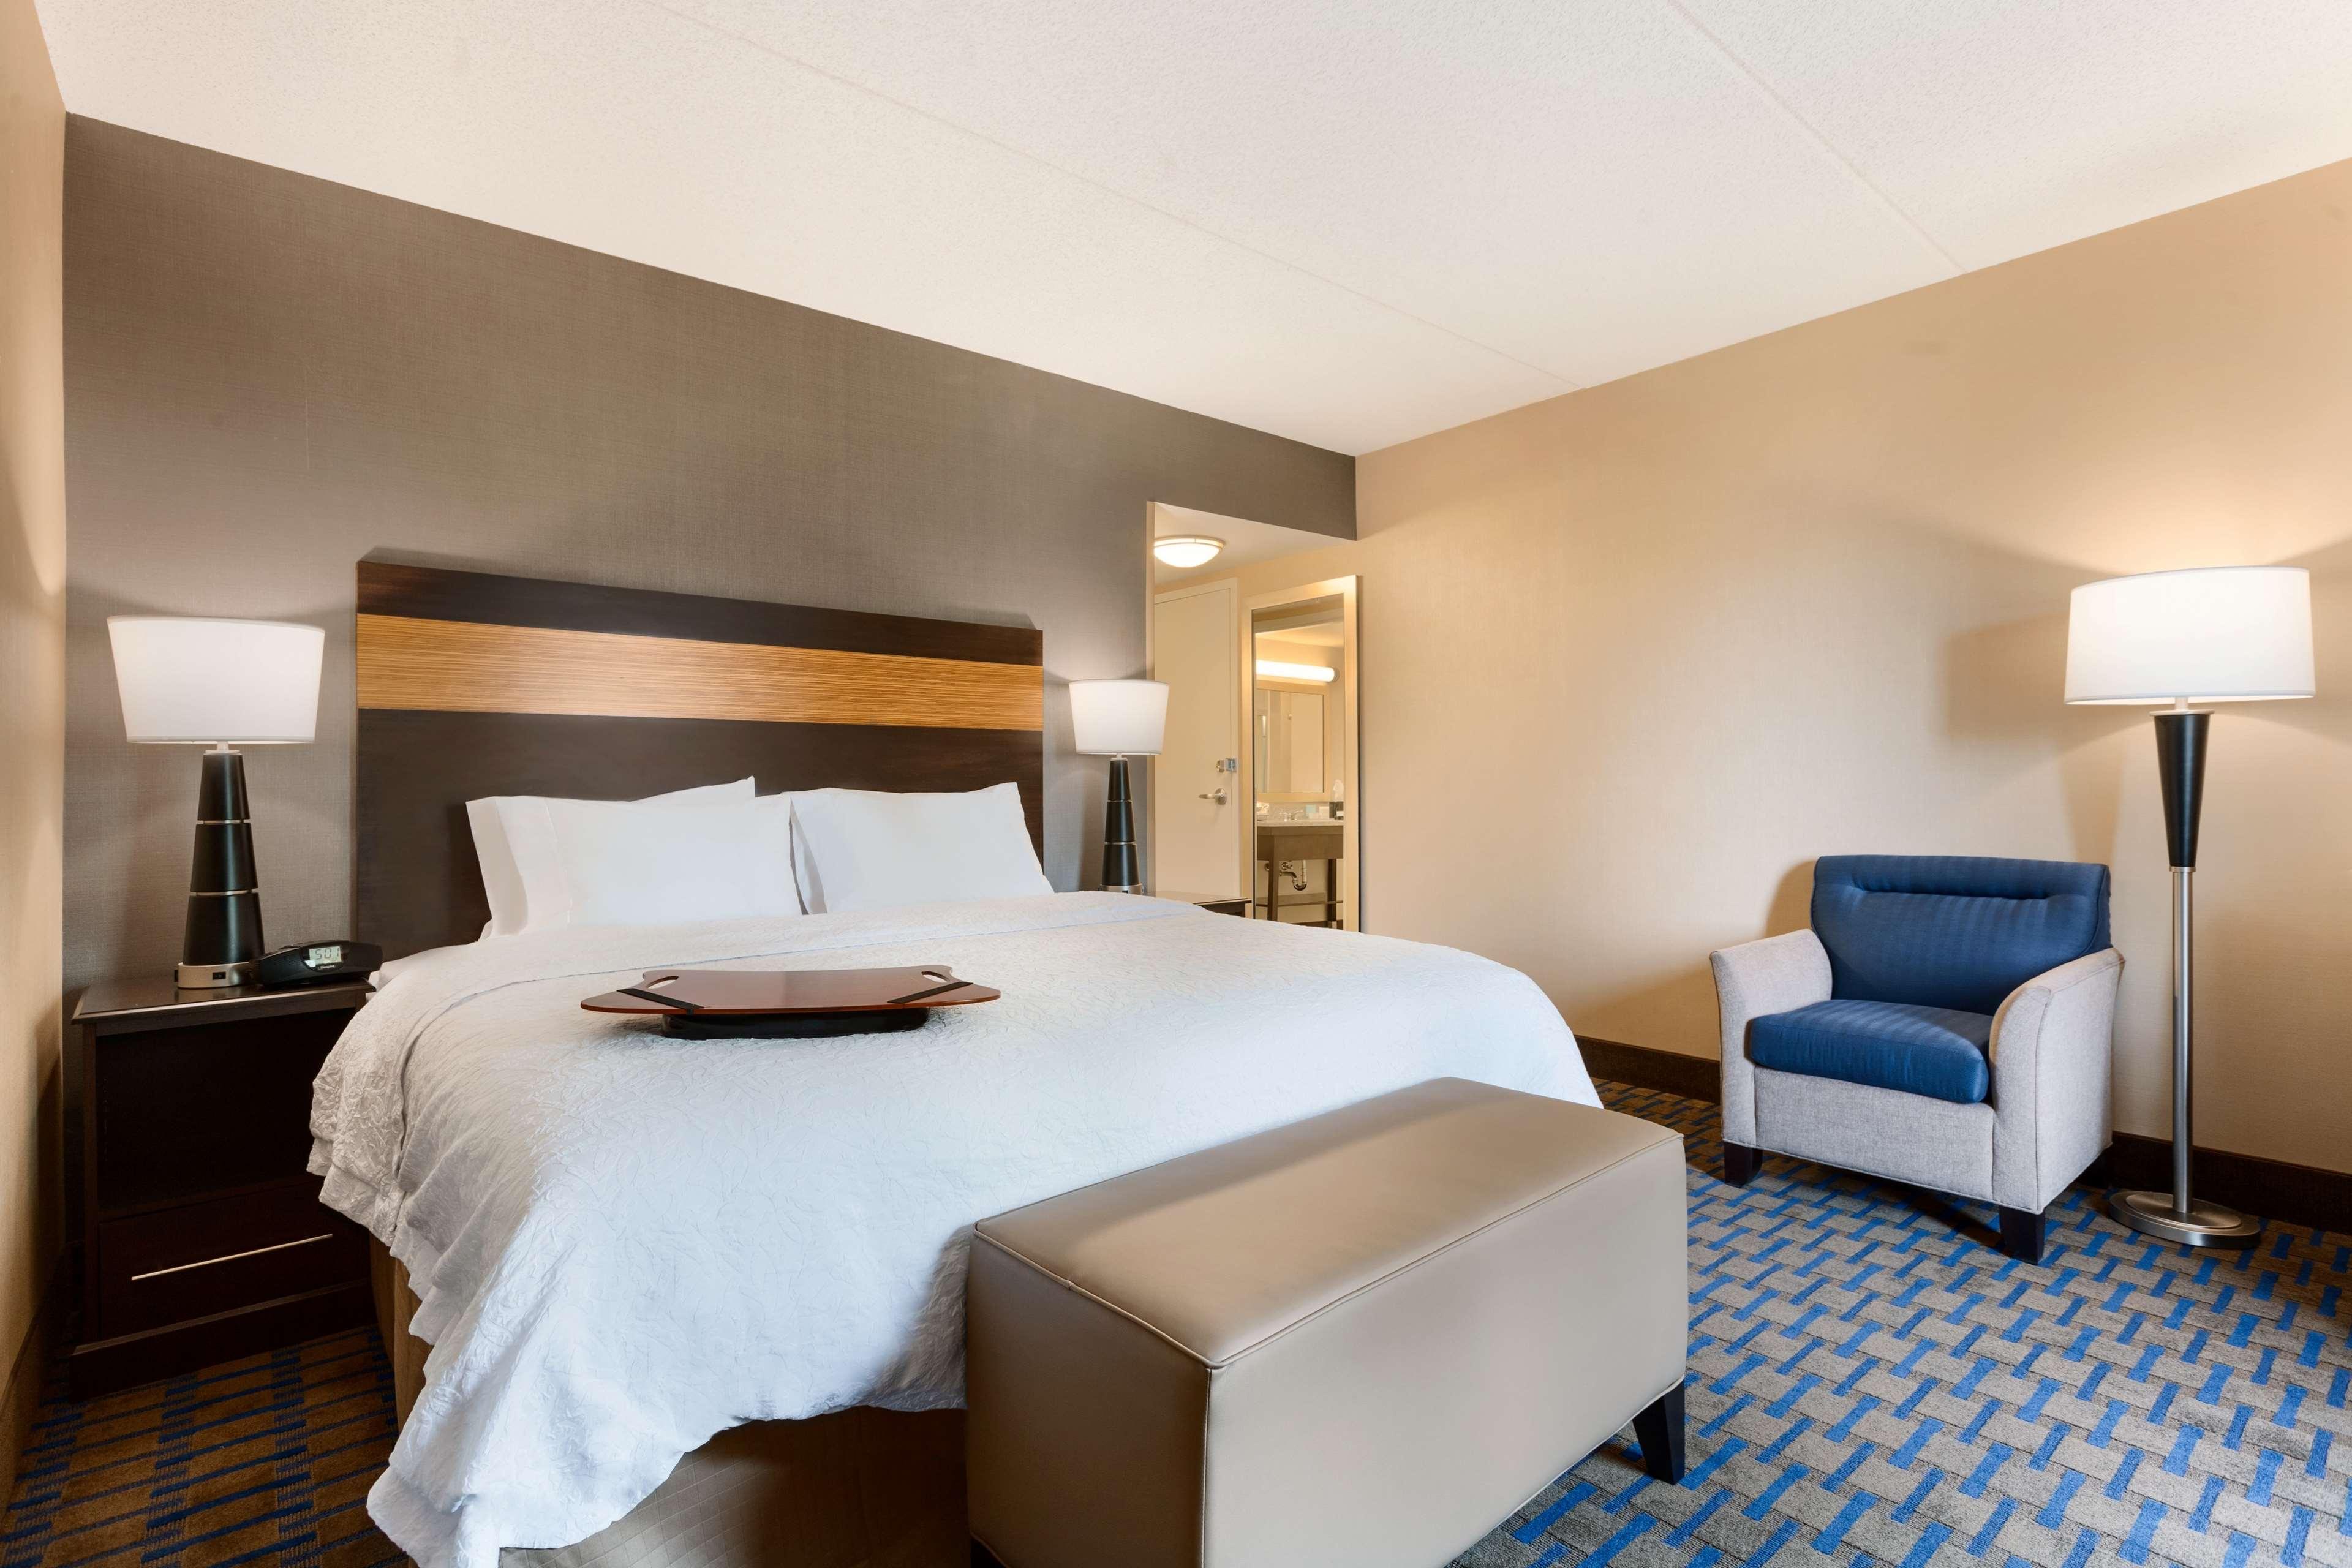 Hampton Inn & Suites Camp Springs/Andrews AFB image 9